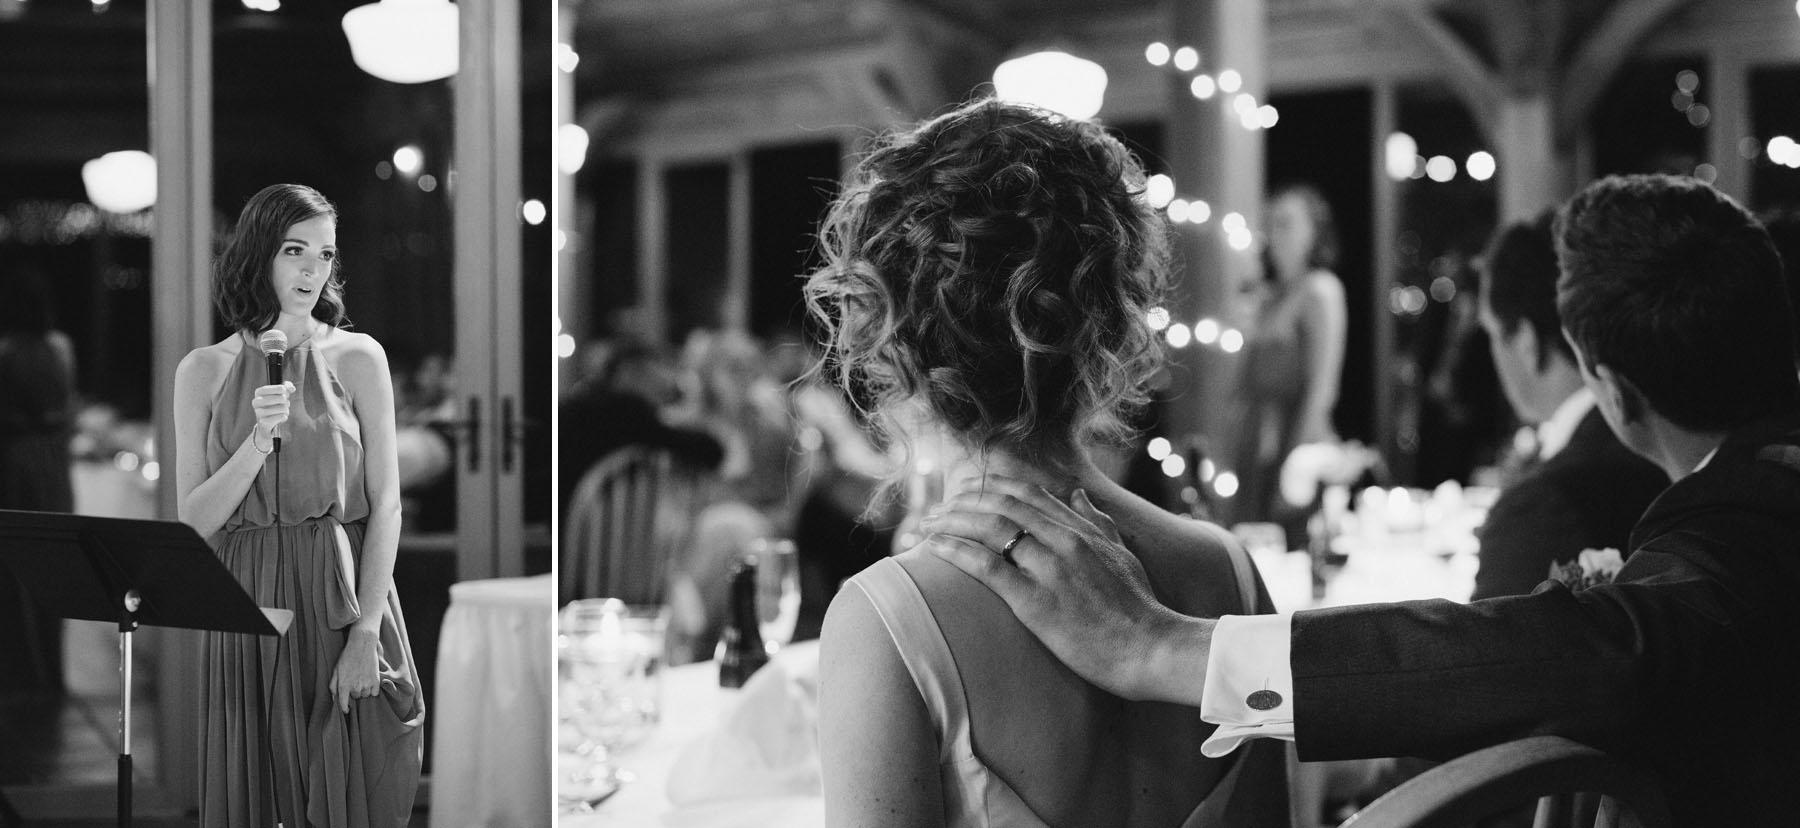 thetis-island-wedding-photographer-rp-rn-182.jpg